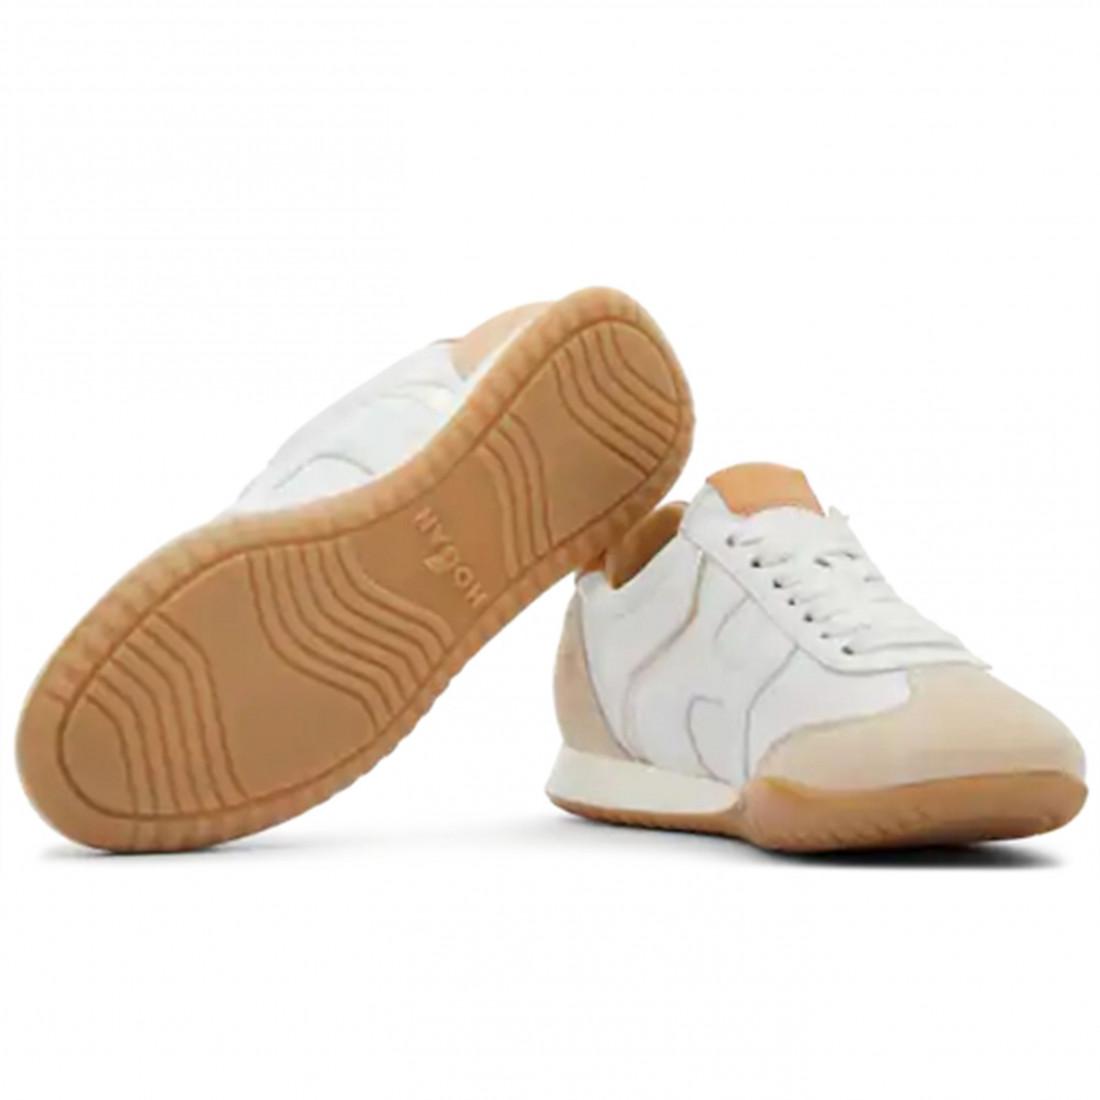 sneakers donna hogan hxw5650do00poo0sre 8090